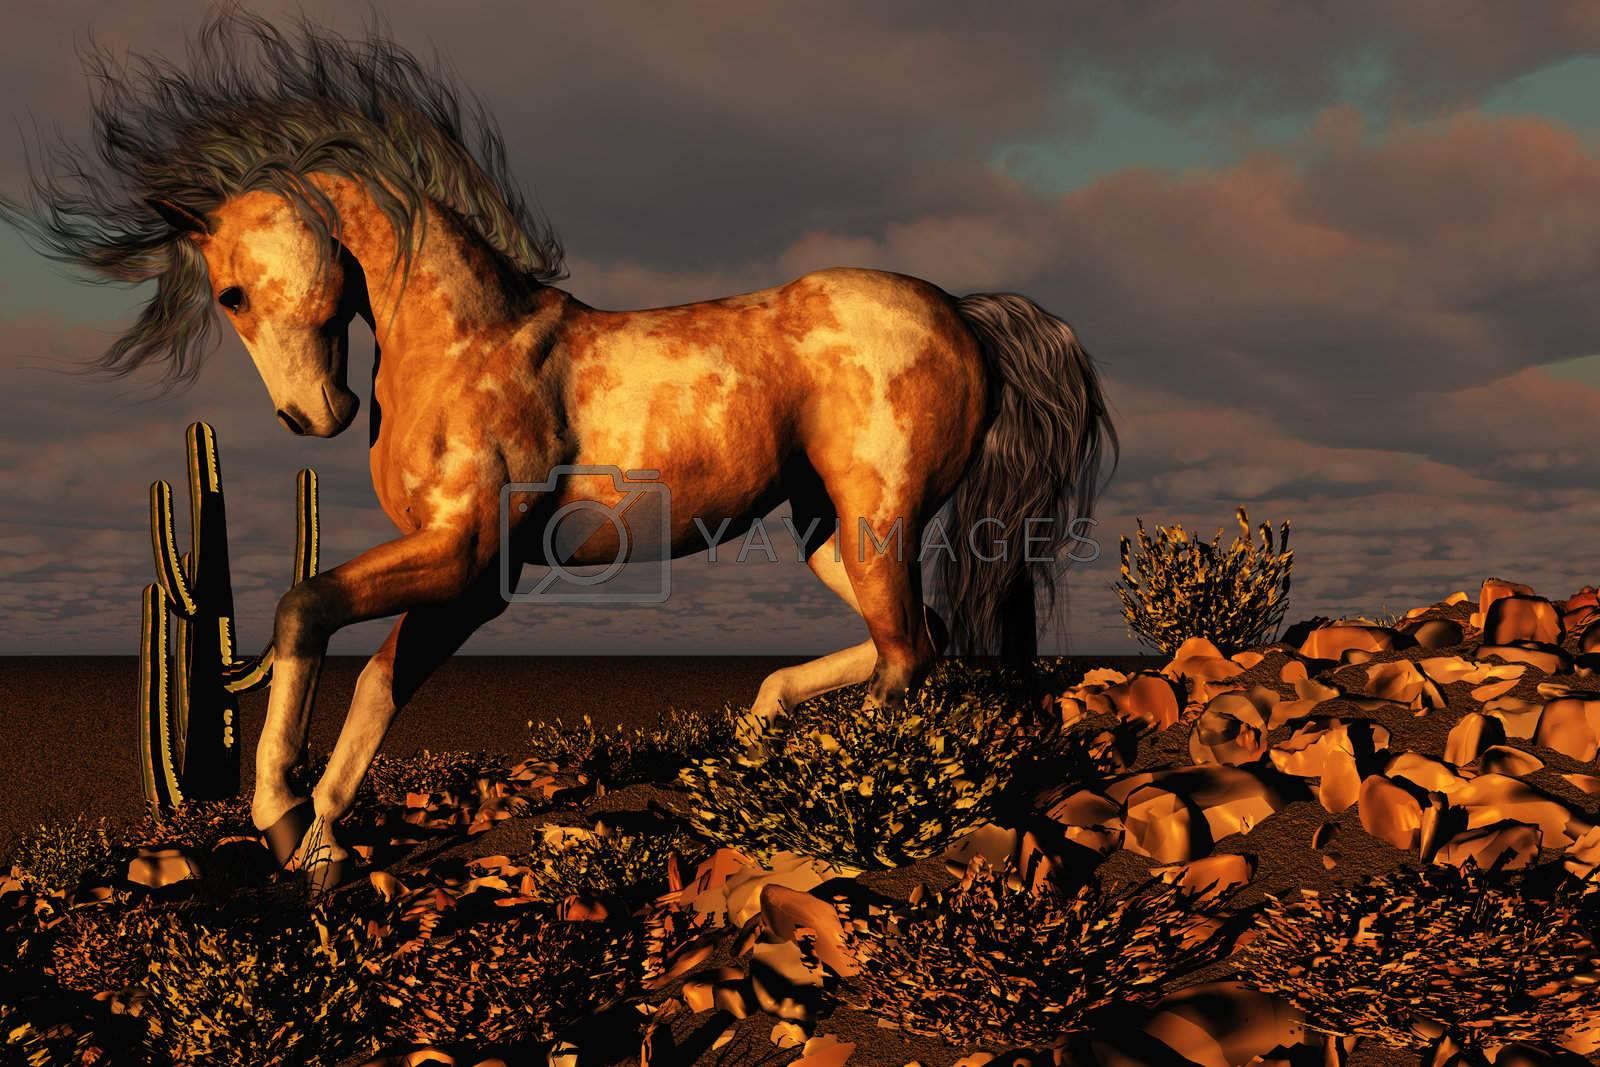 A wild paint horse runs down a rocky hill in the desert.